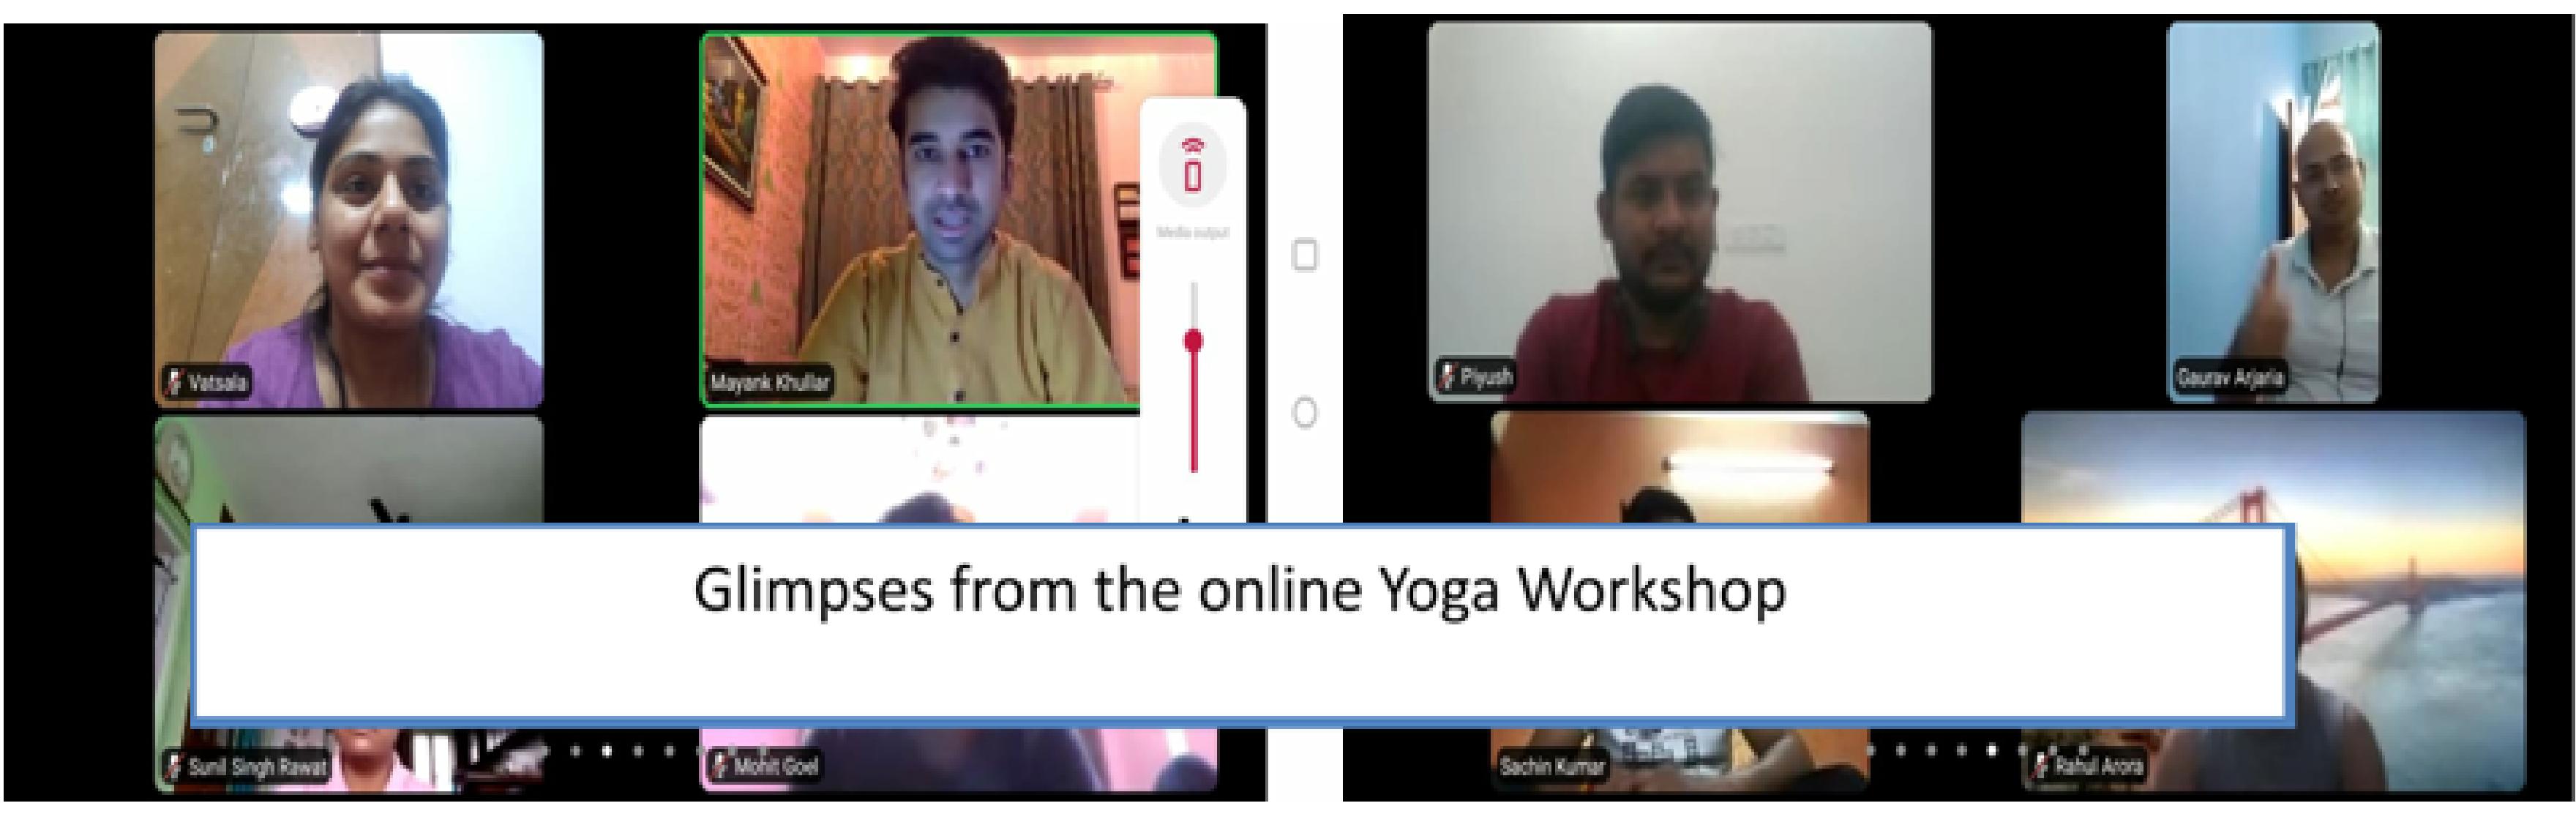 SECI Organizes Online Yoga Workshop for Employees